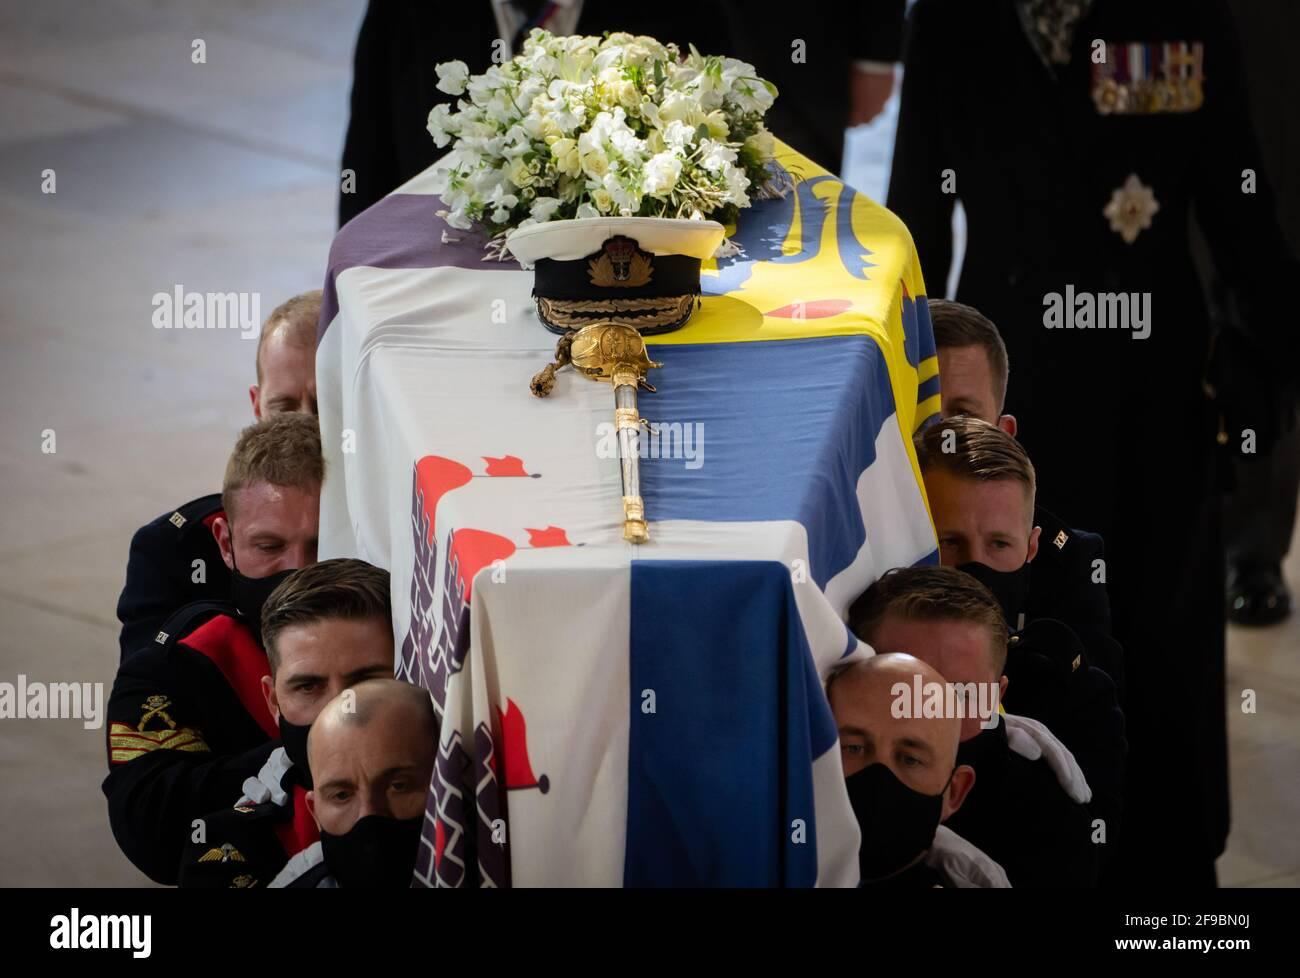 Portadores de Pall que llevaban el ataúd durante el funeral del duque de Edimburgo en la capilla de San Jorge, Castillo de Windsor, Berkshire. Fecha de la foto: Sábado 17 de abril de 2021. Foto de stock